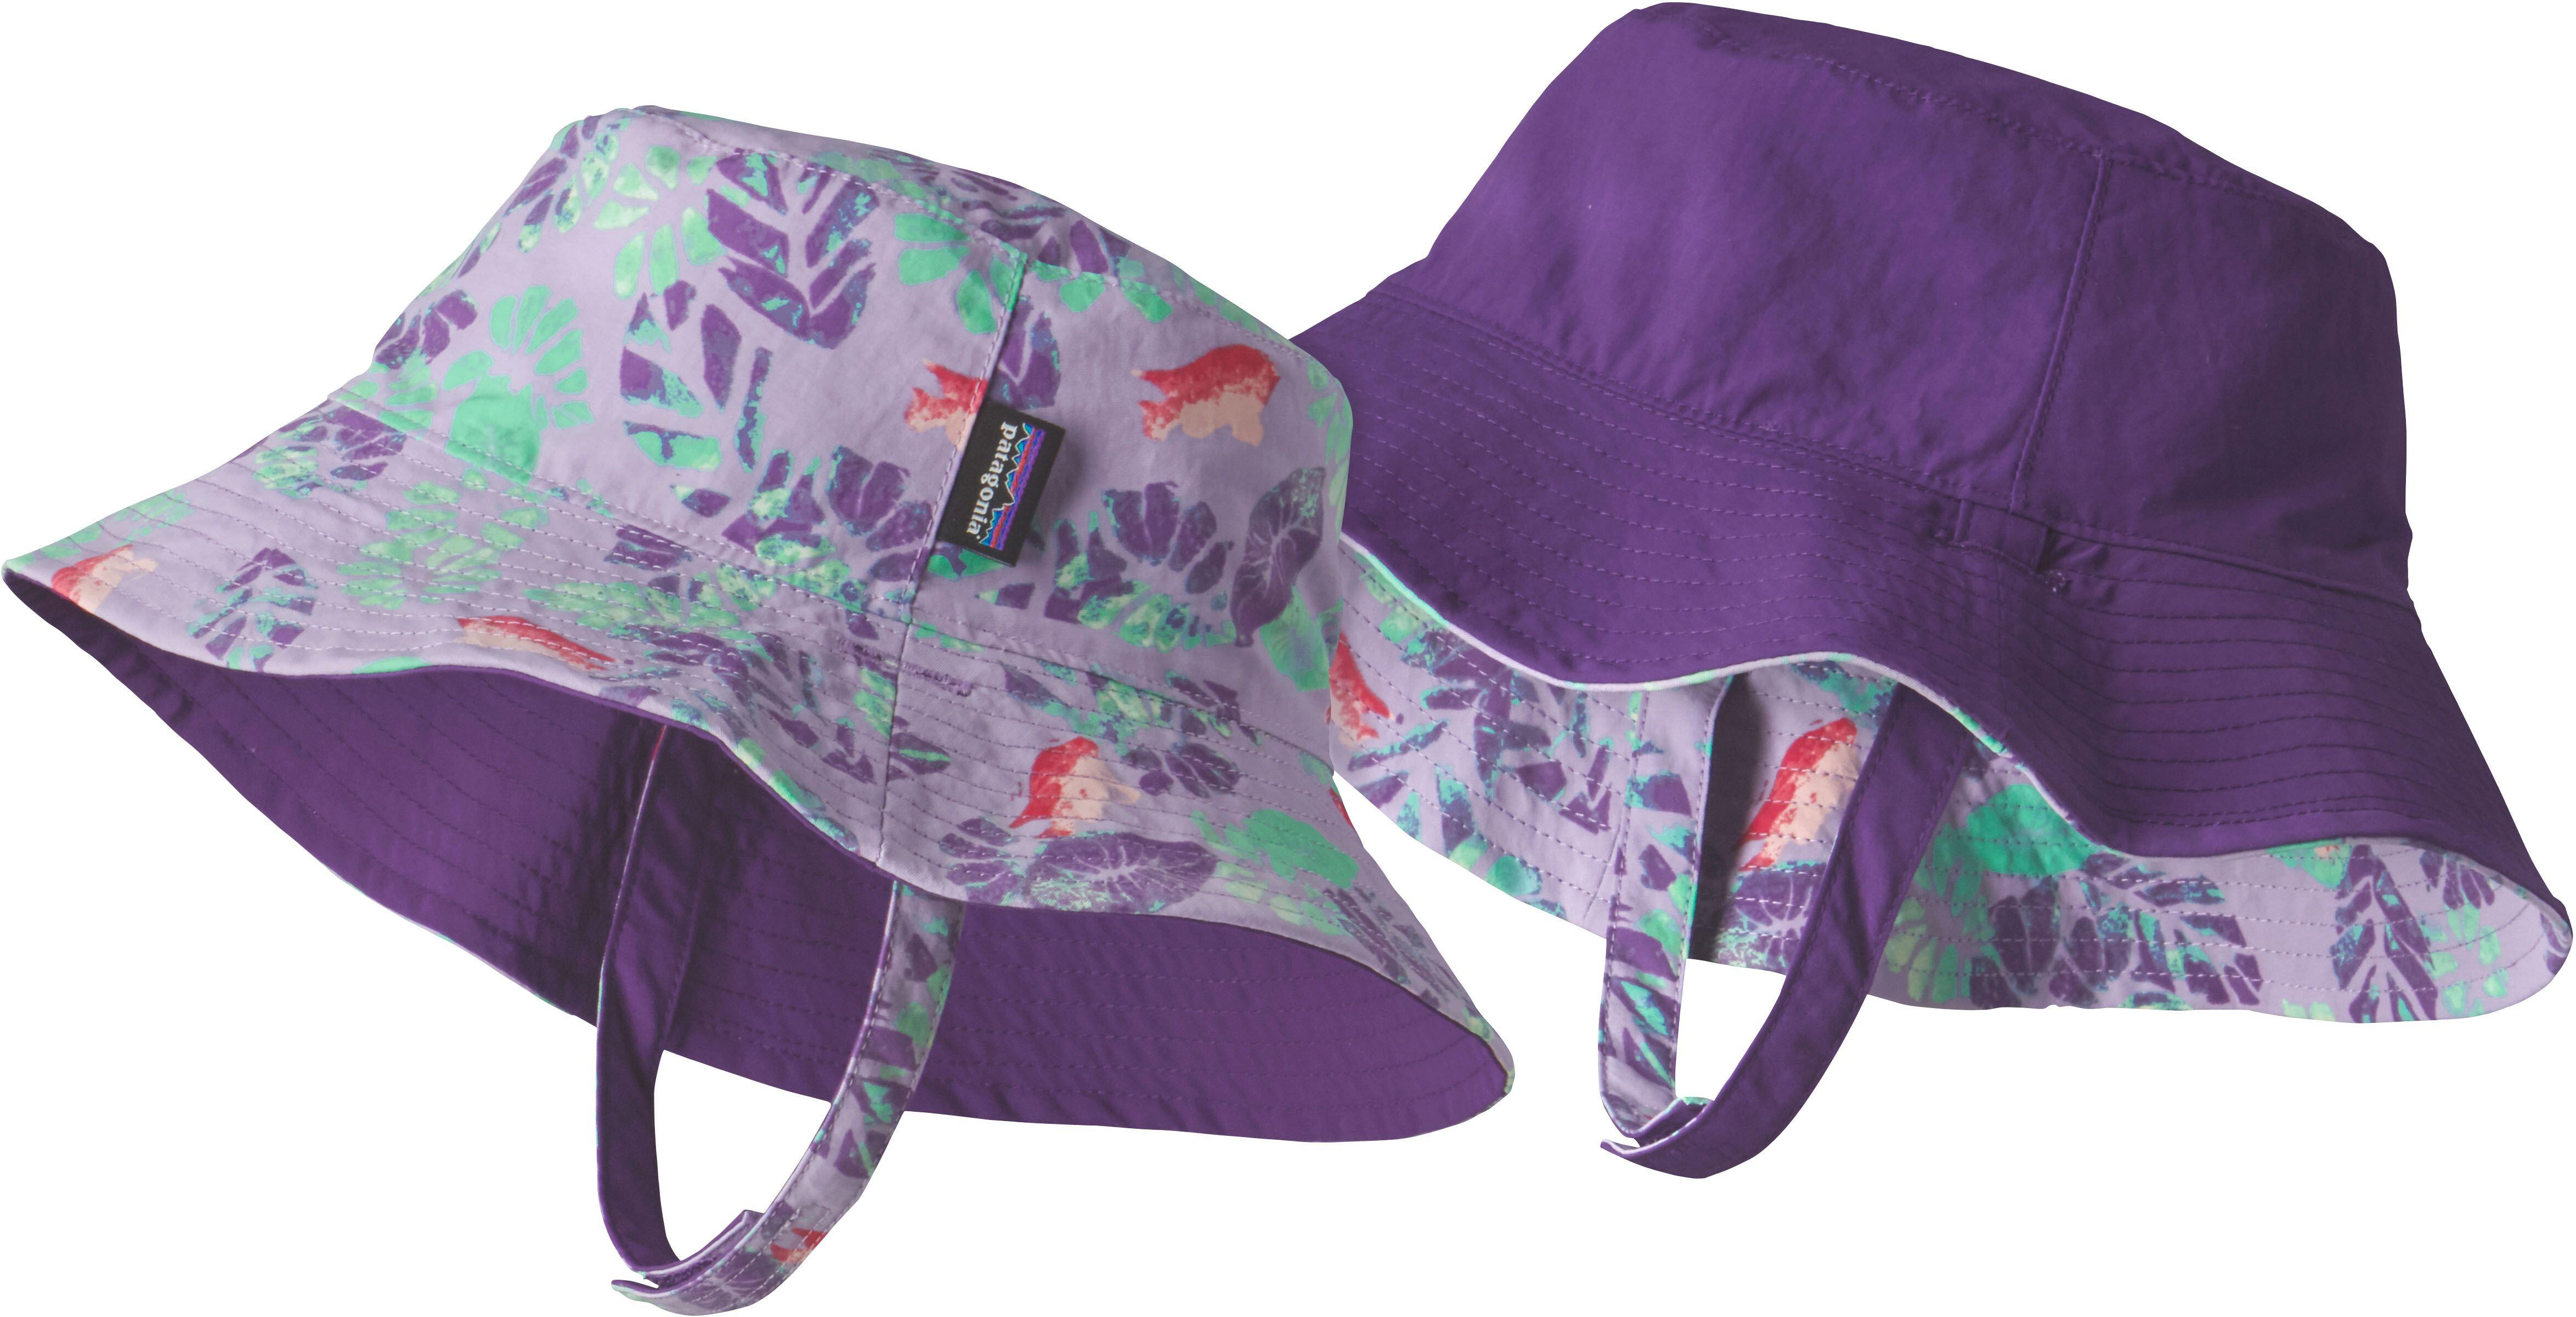 54ab2733c Patagonia Sun Bucket Hat Barn garibaldi tropics: petoskey purple